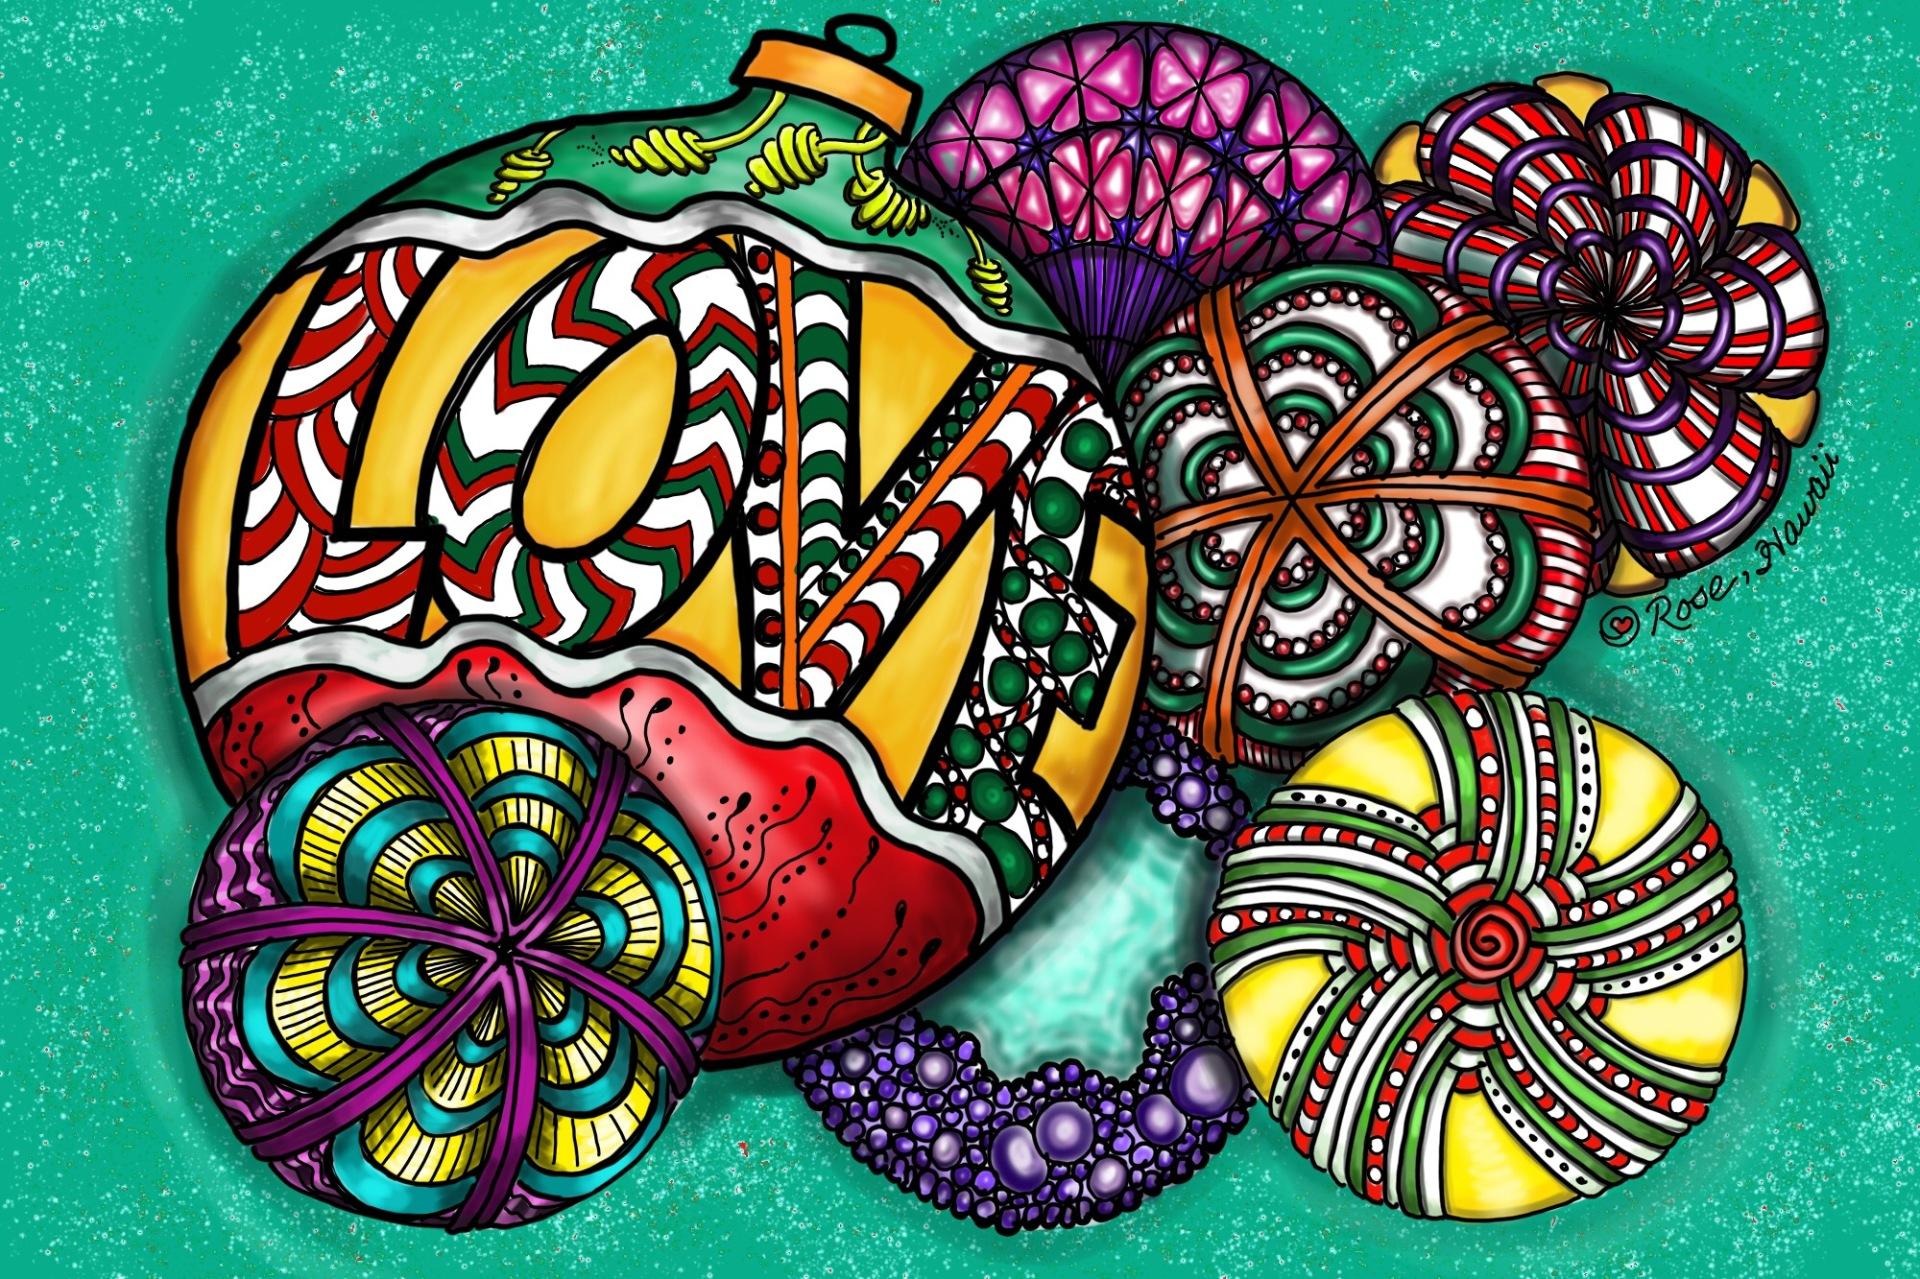 Zentangle Inspired Love Ornaments